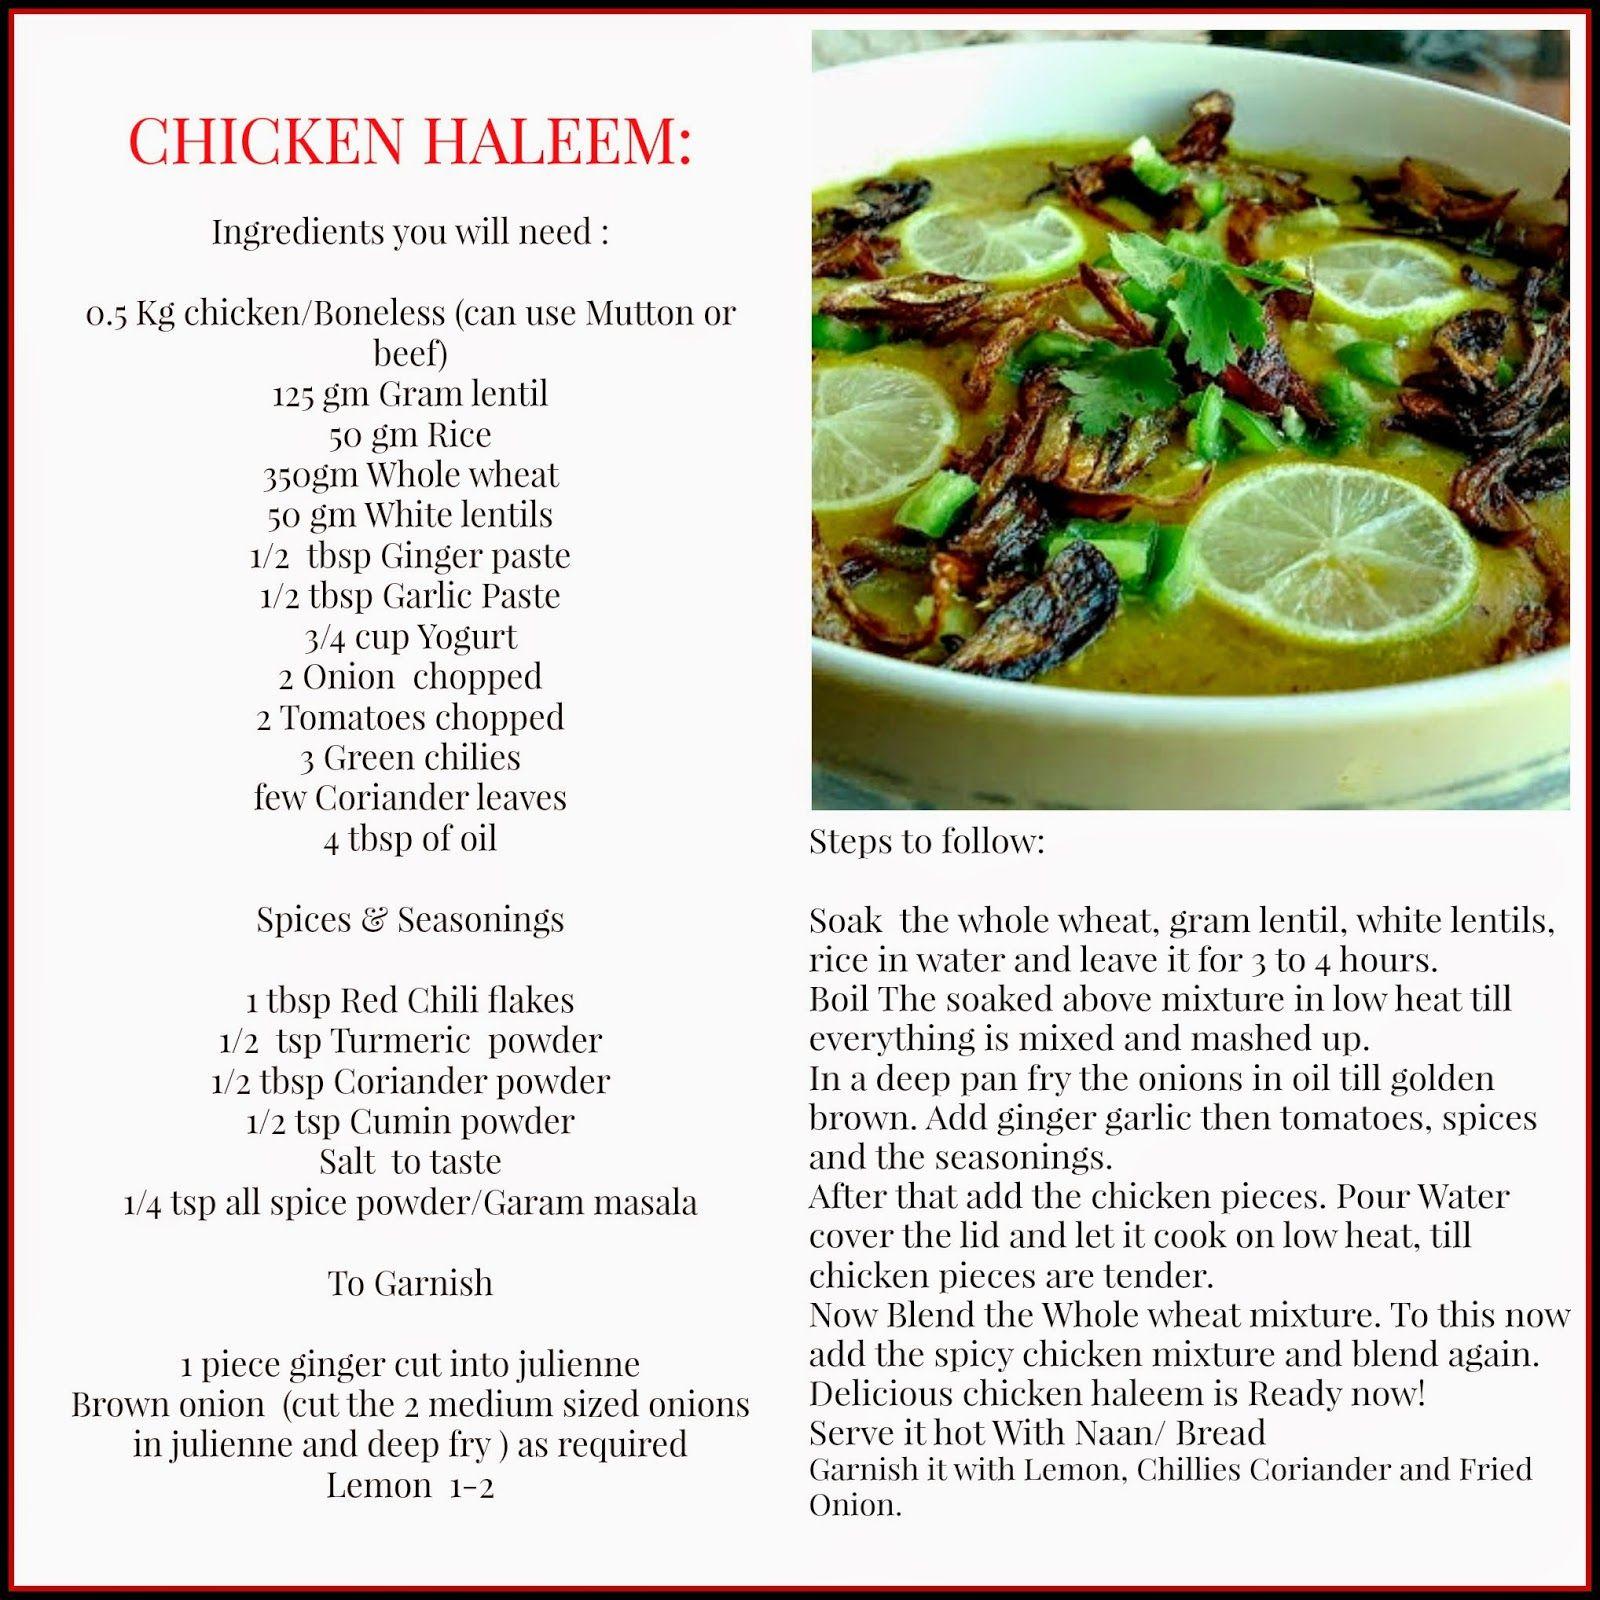 Chicken Haleem From Pakistan Recipes Indian Food Recipes Food